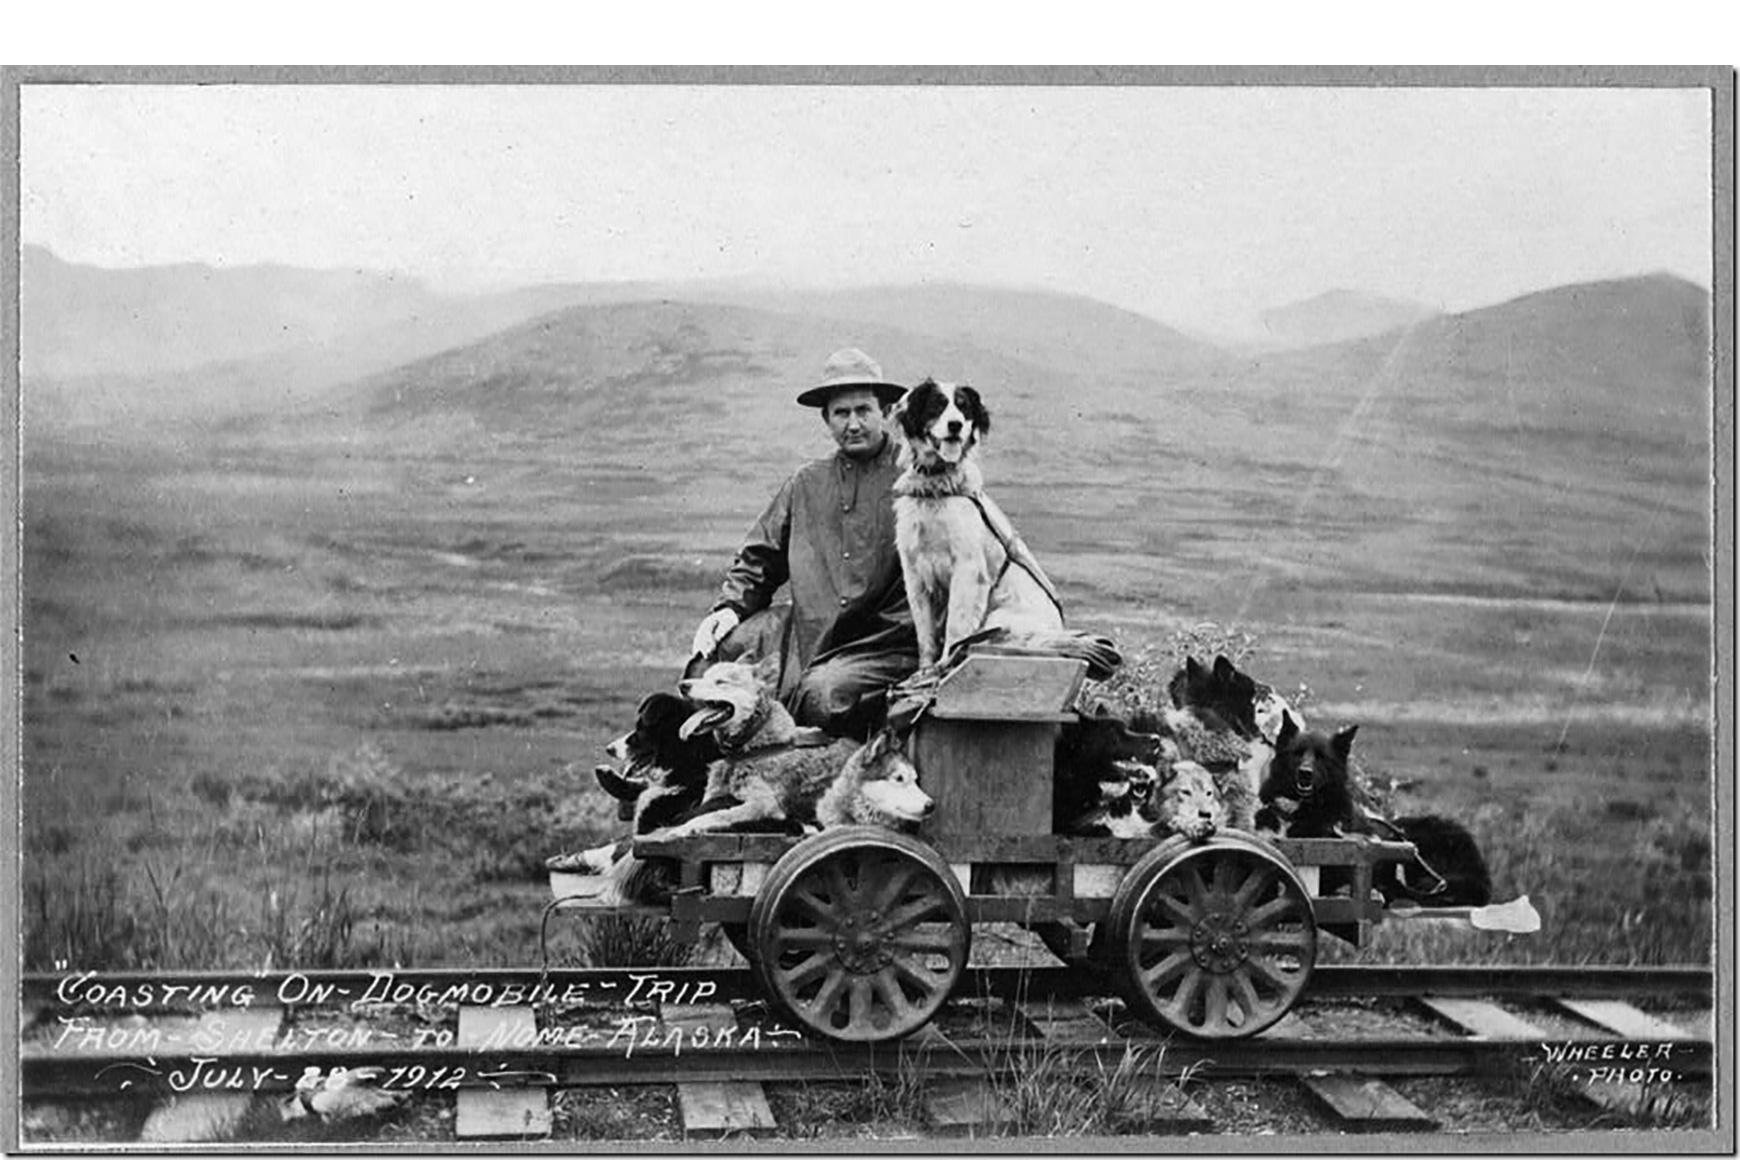 Fotograaf onbekend, Alaska, 1928 - Collectie Granddaughter L. Johnson/ Library of Congress